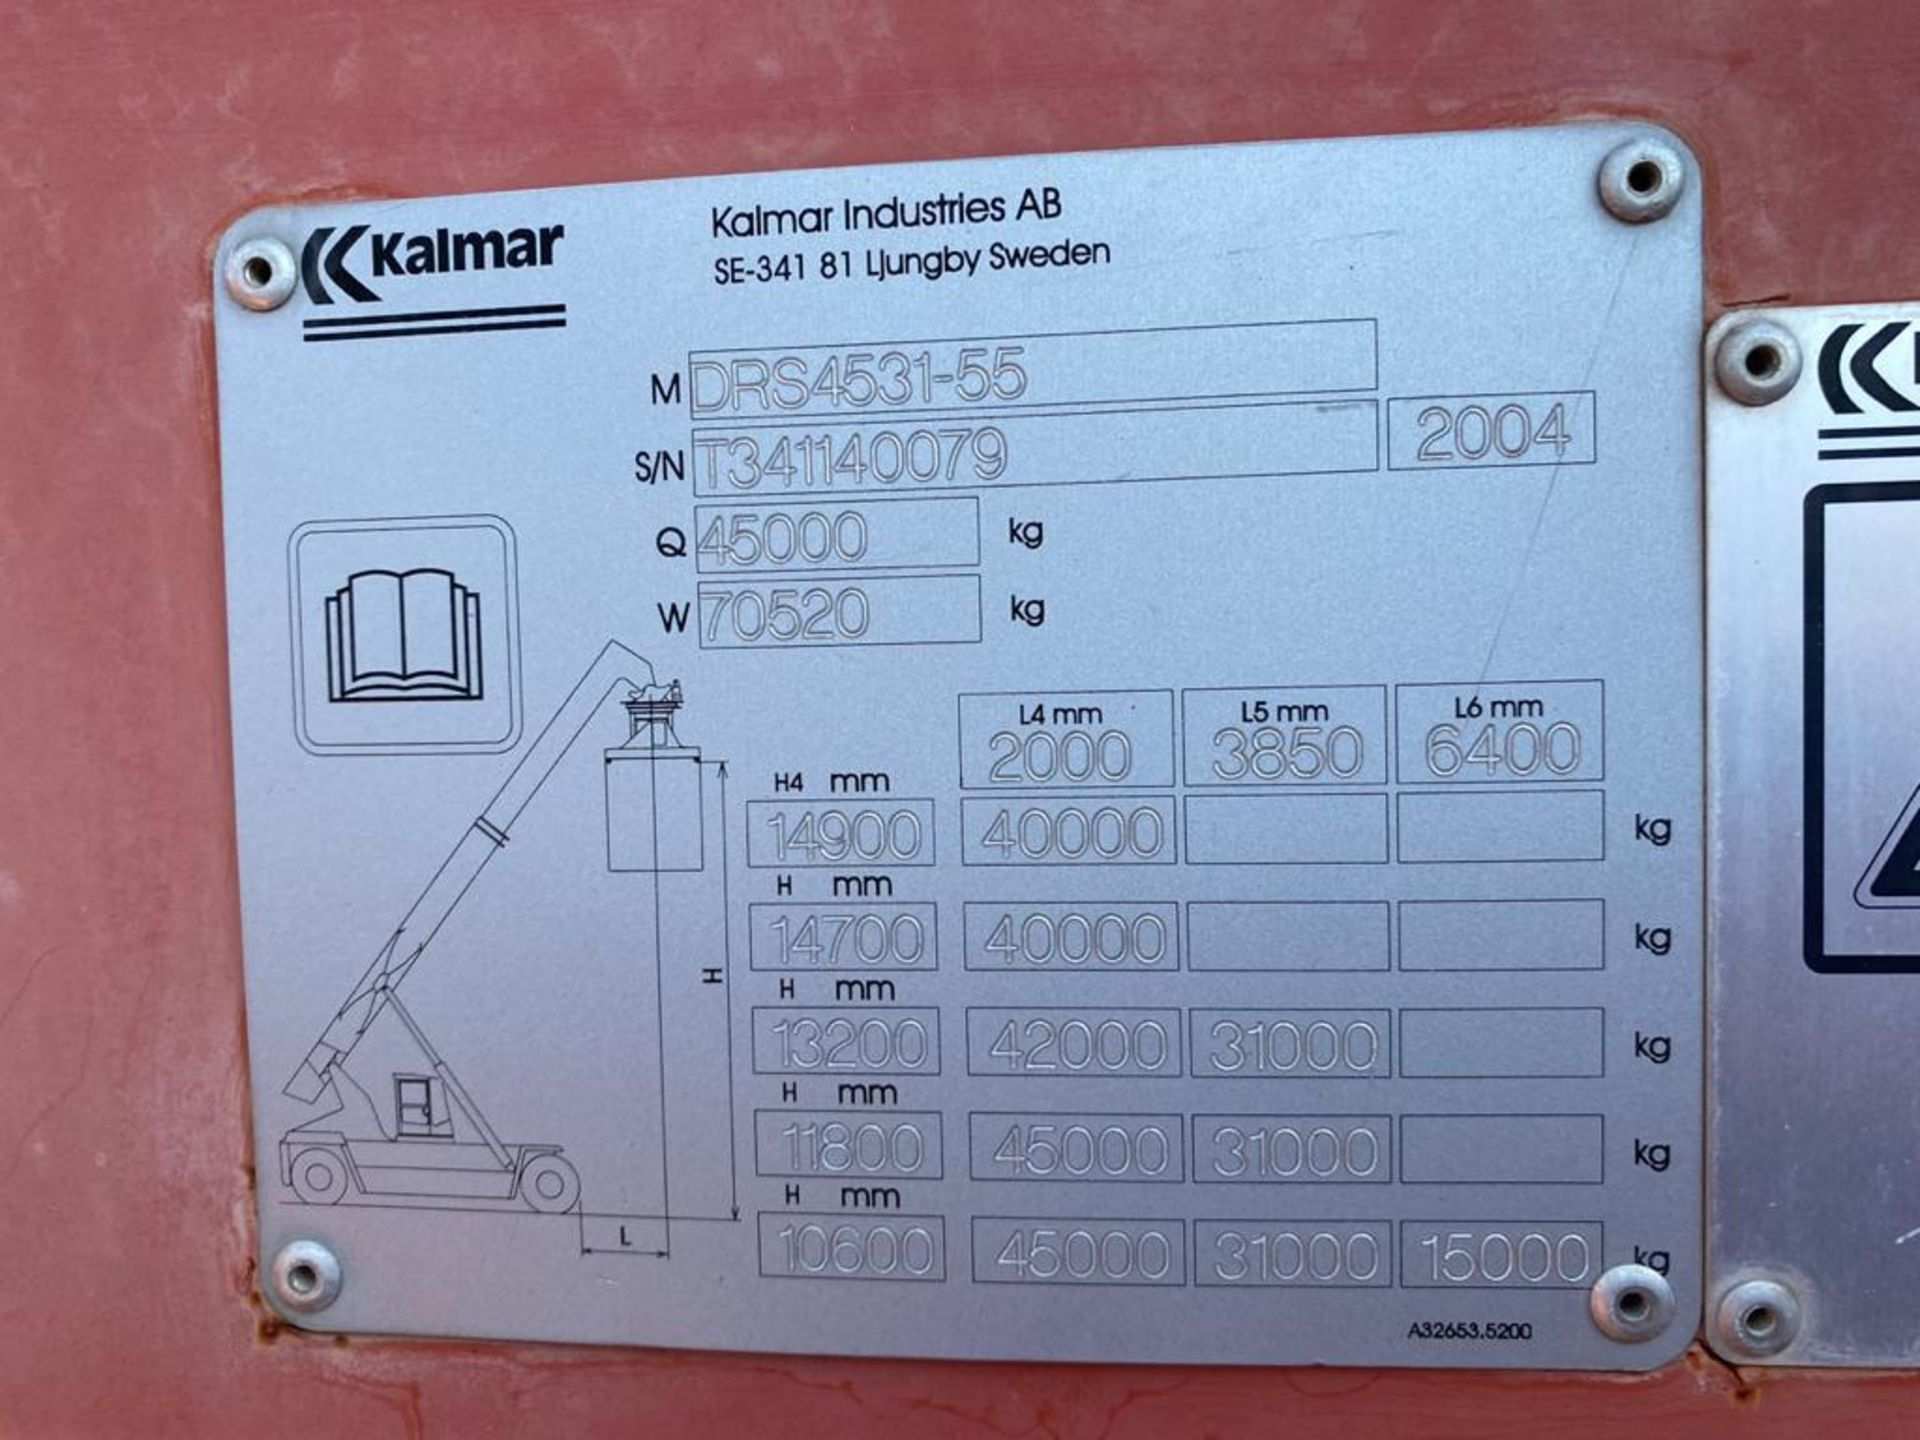 Reach Stacker marca Kalmar, año 2004, modelo DRS4531-55, No de serie T341140079 - Image 54 of 57